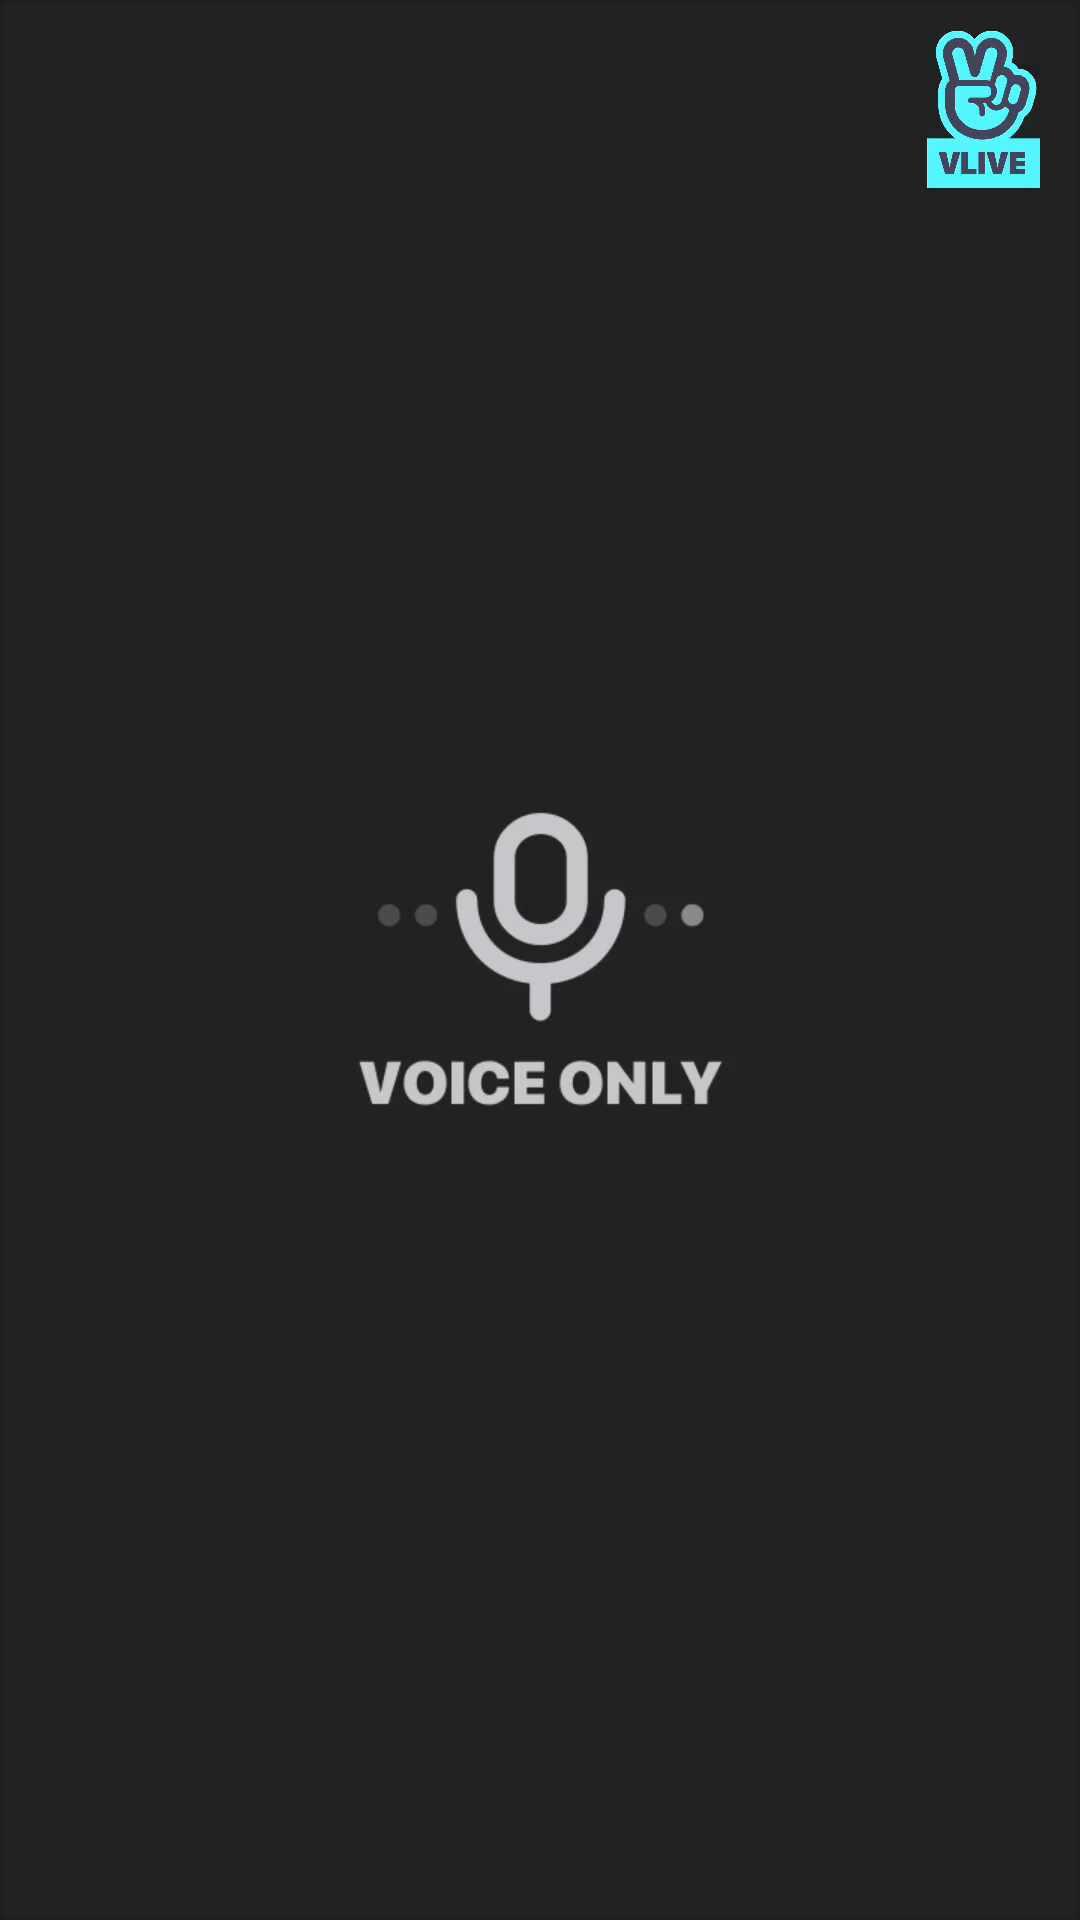 [RADIO] 캐럿들 귀대귀대 #88